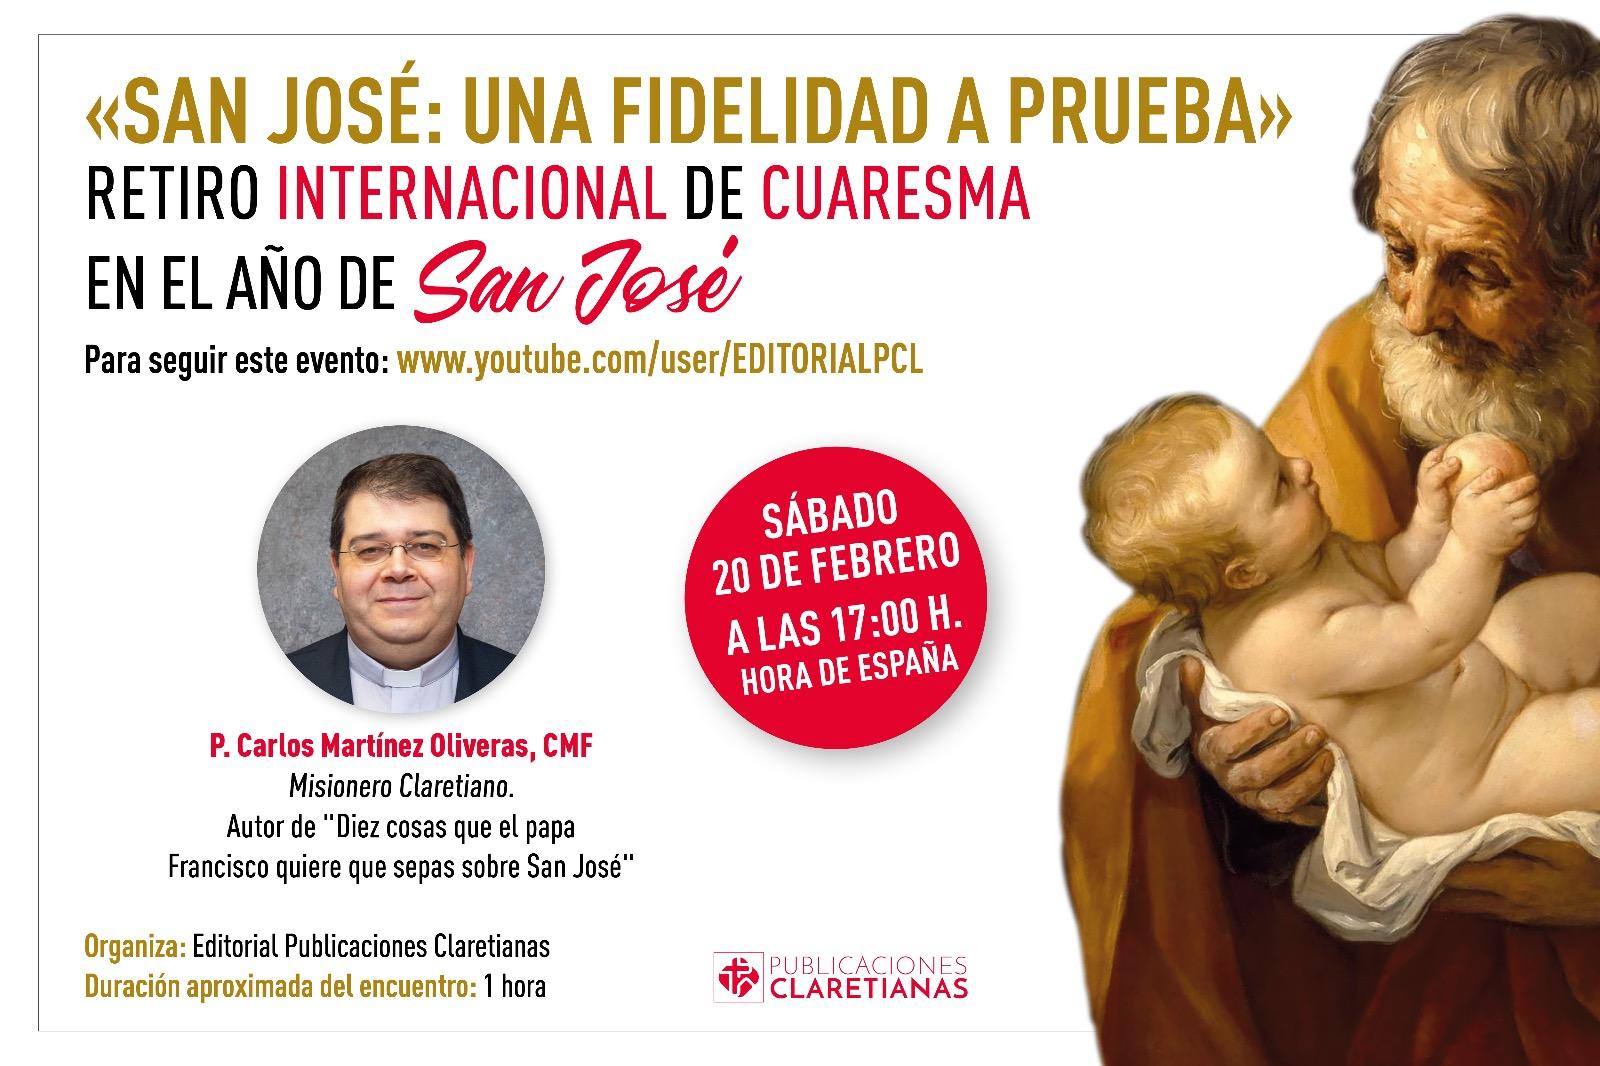 RETIRO INTERNACIONAL DE CUARESMA (AÑO DE SAN JOSÉ)